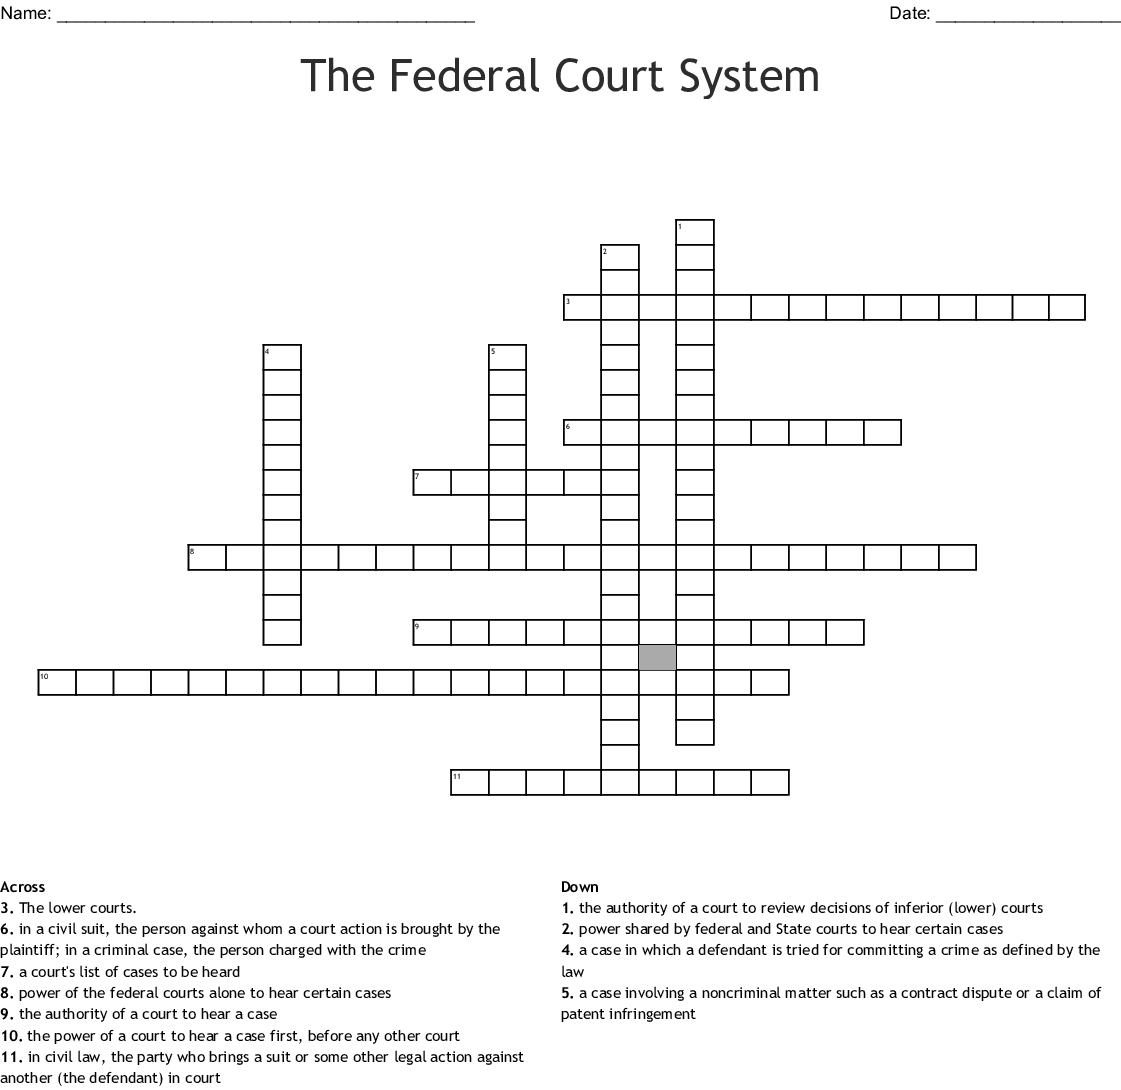 Supreme Court Vocabulary Crossword Puzzle